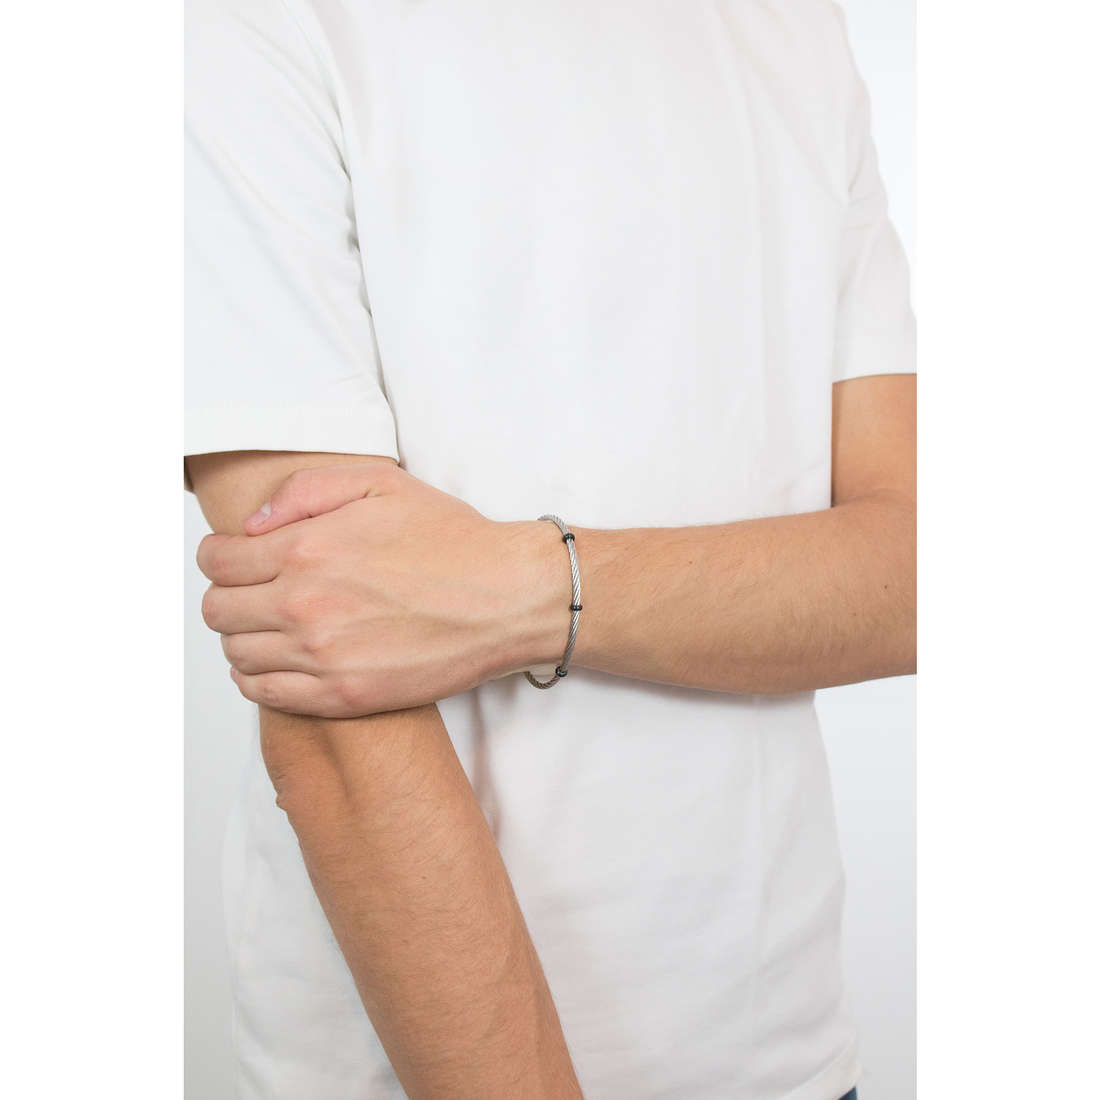 Morellato bracciali Cross uomo SAHU08 indosso